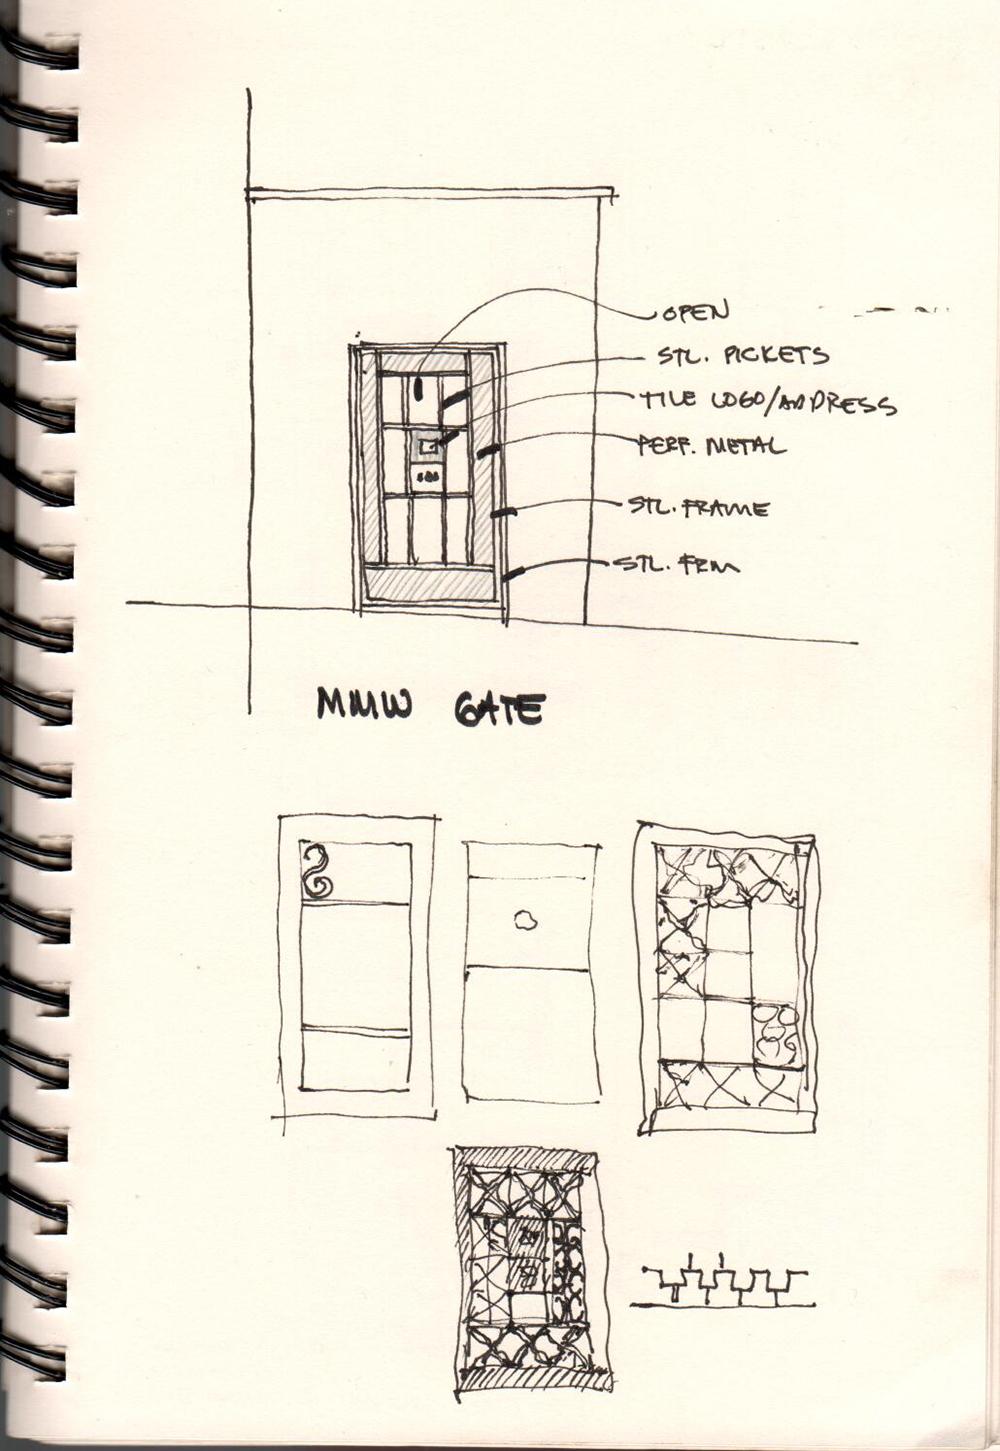 georgearchitecture_studio_mmw-gate_sketch01.jpg